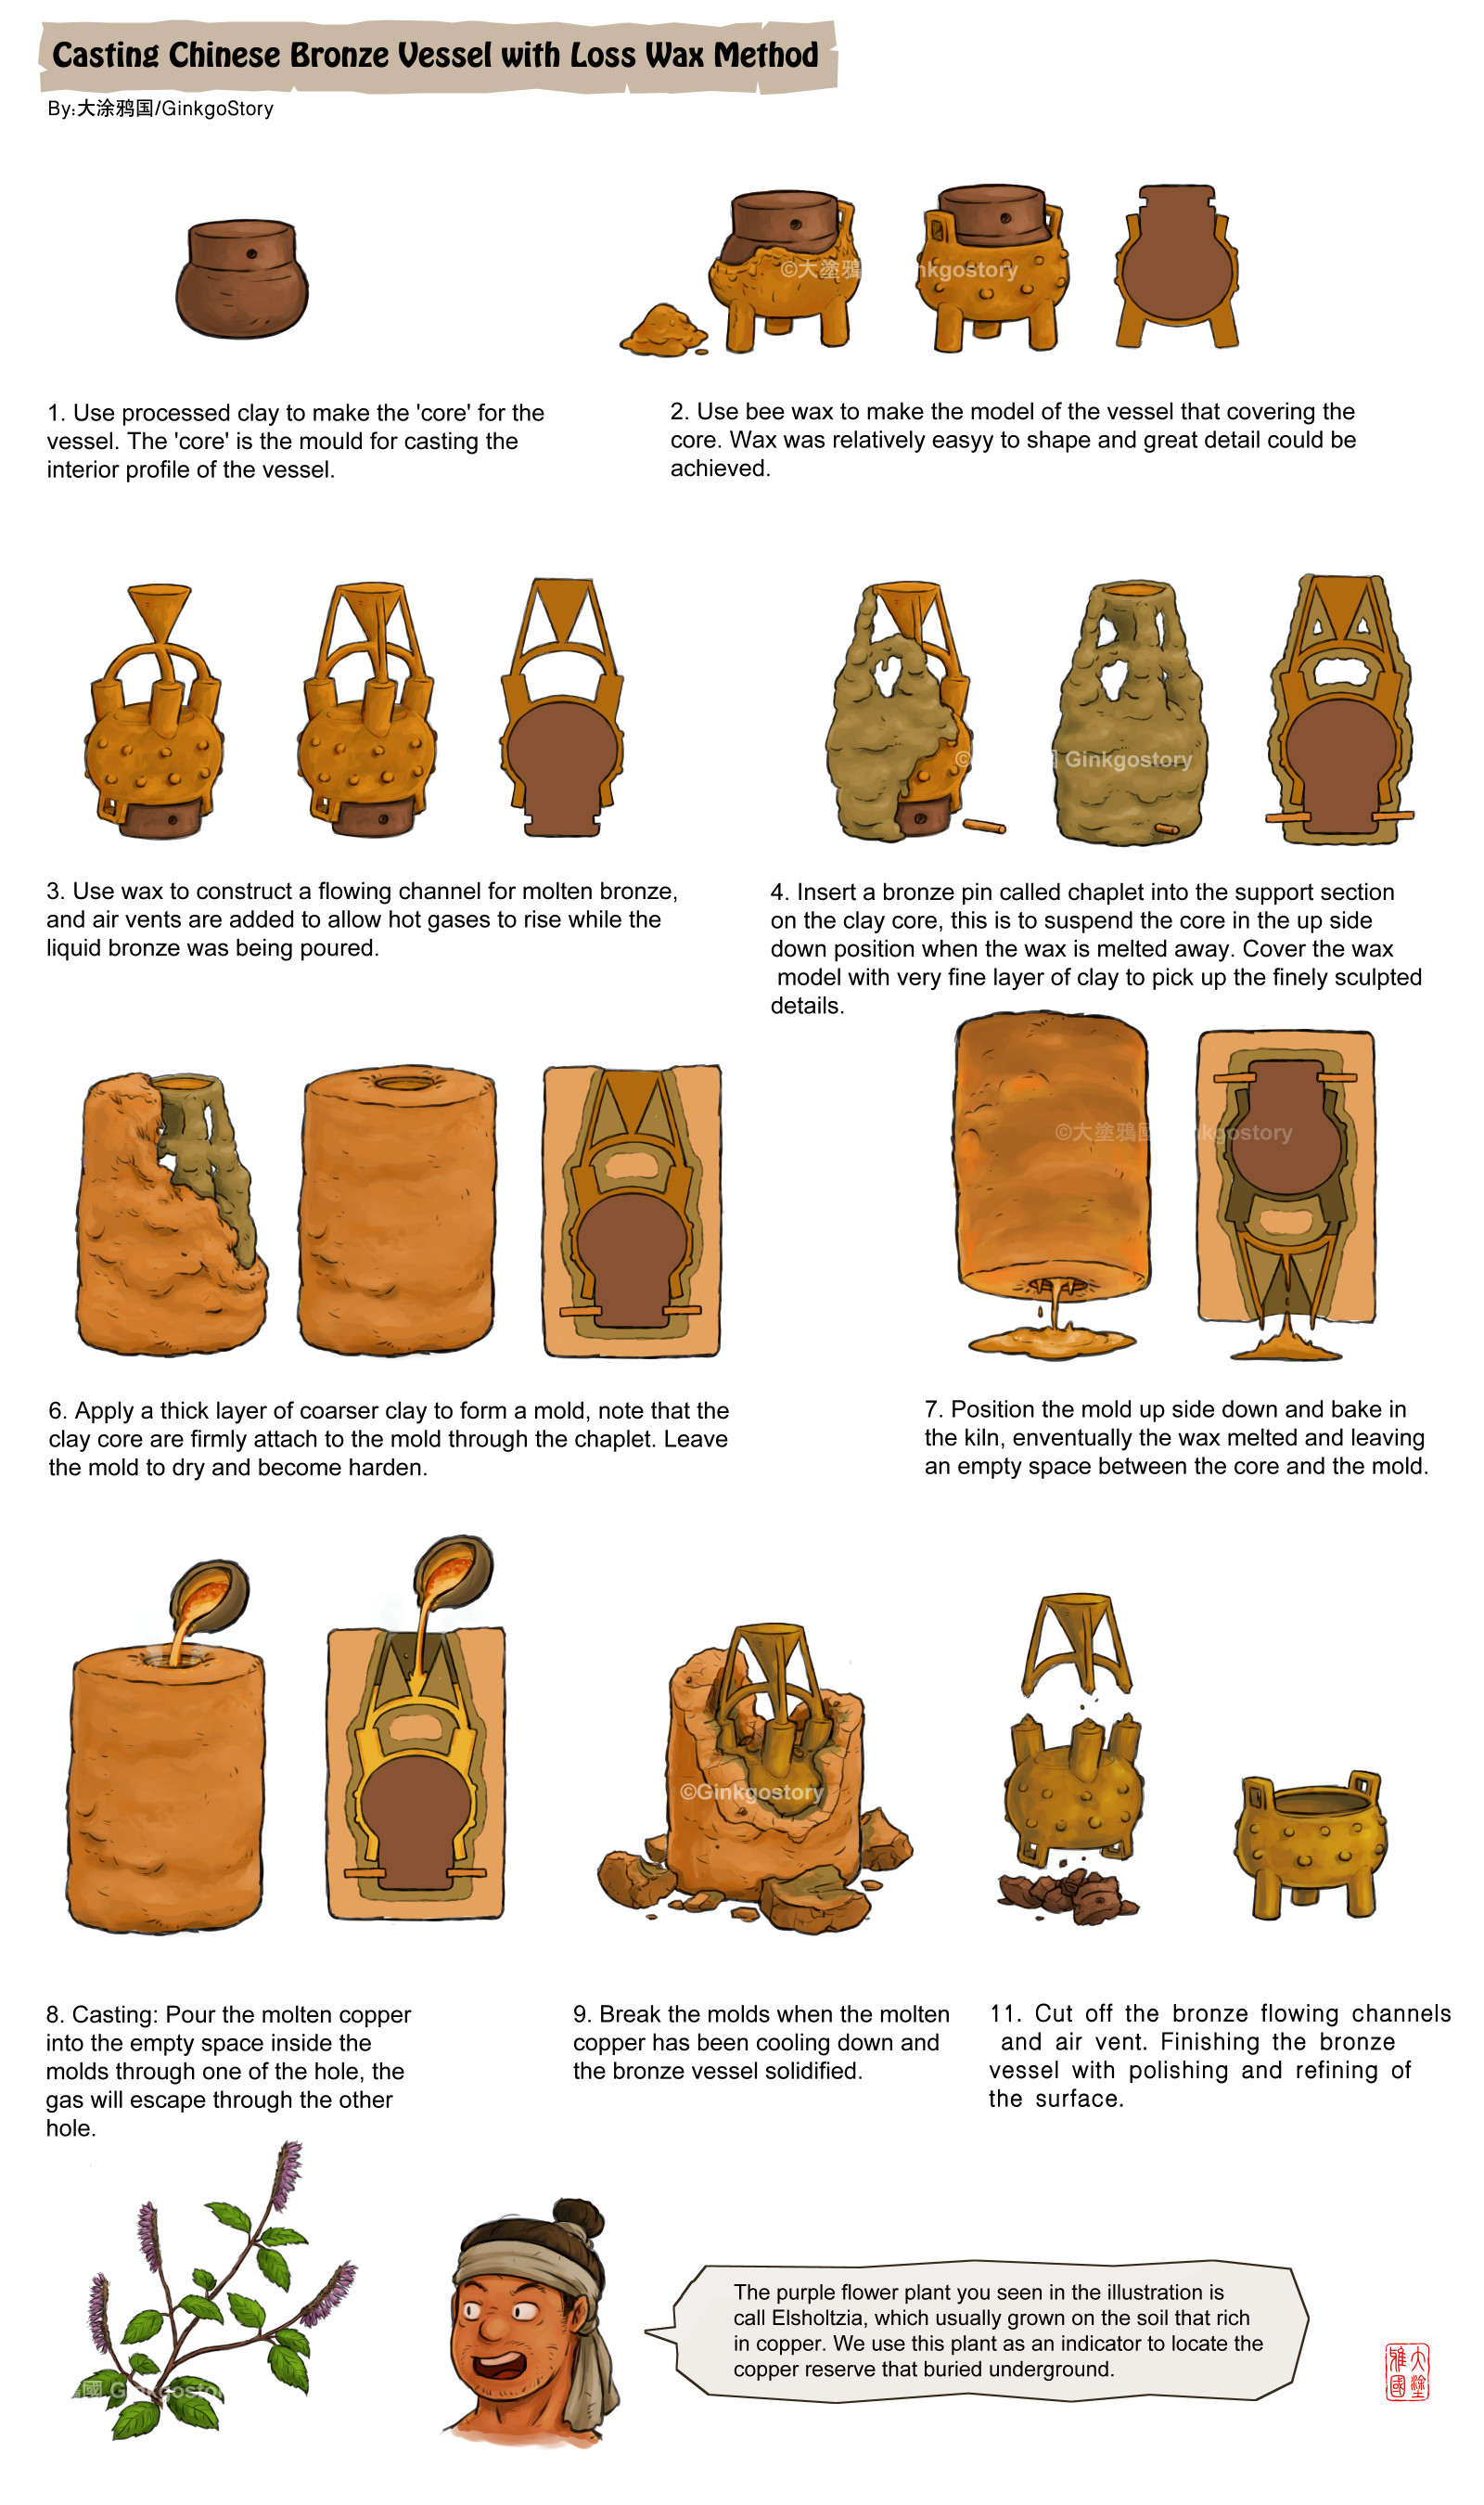 Artstation tong lu shan copper mine during the chun qiu period lost wax bronze vessel casting pooptronica